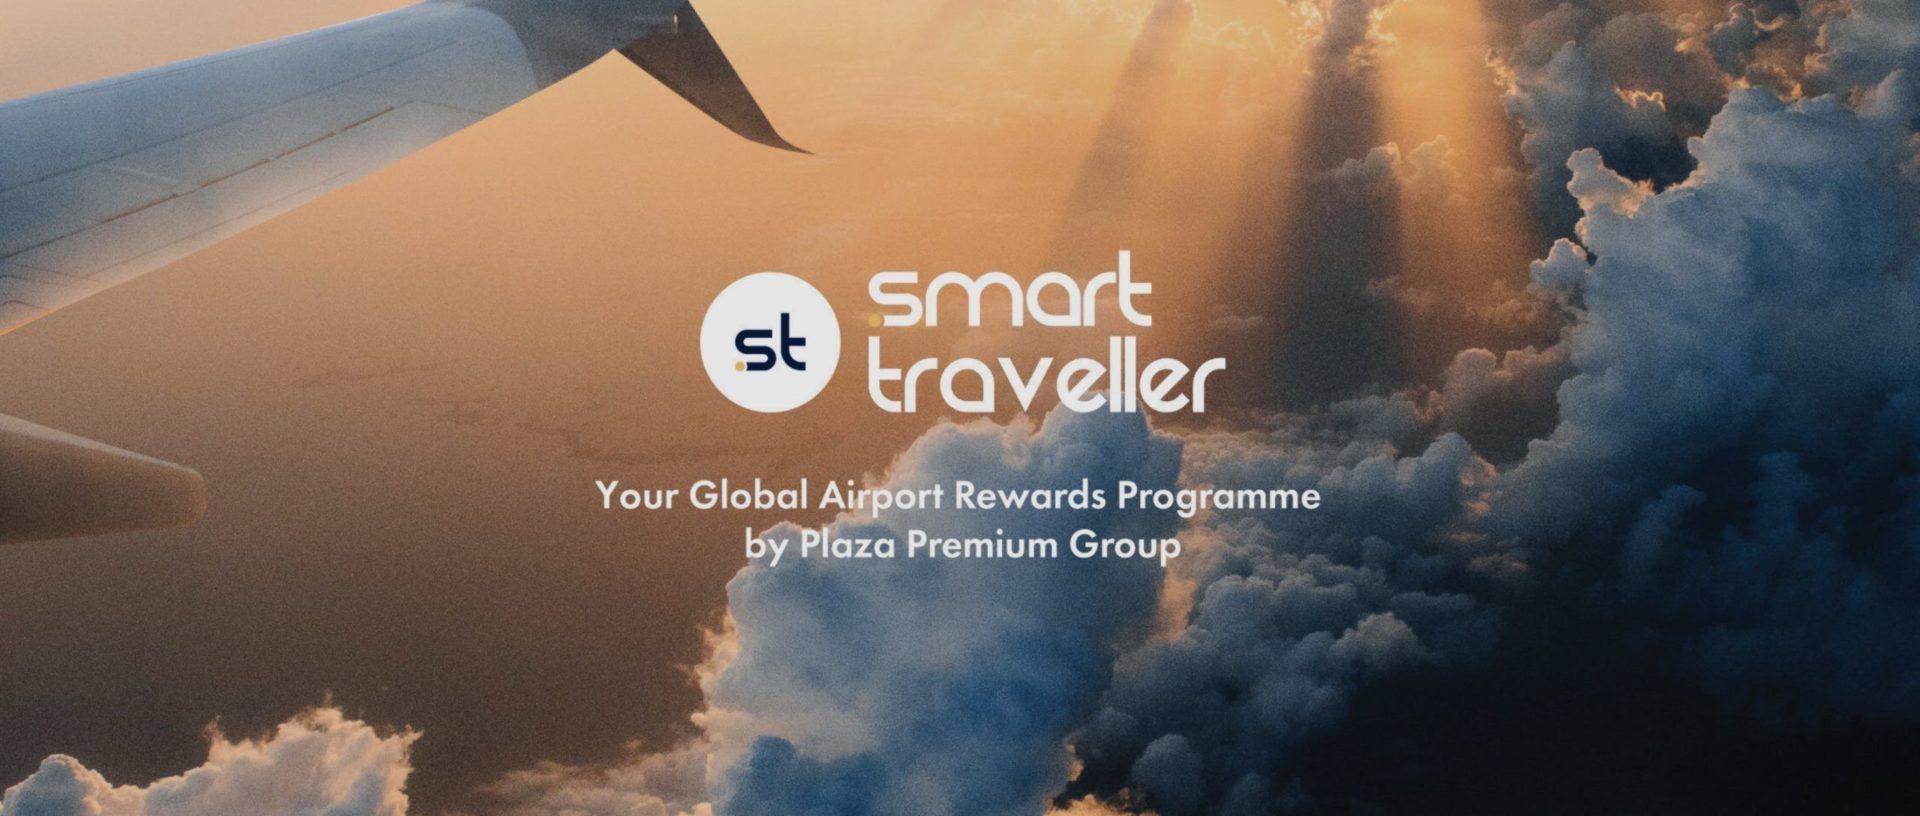 Smart Traveller Plaza Premium